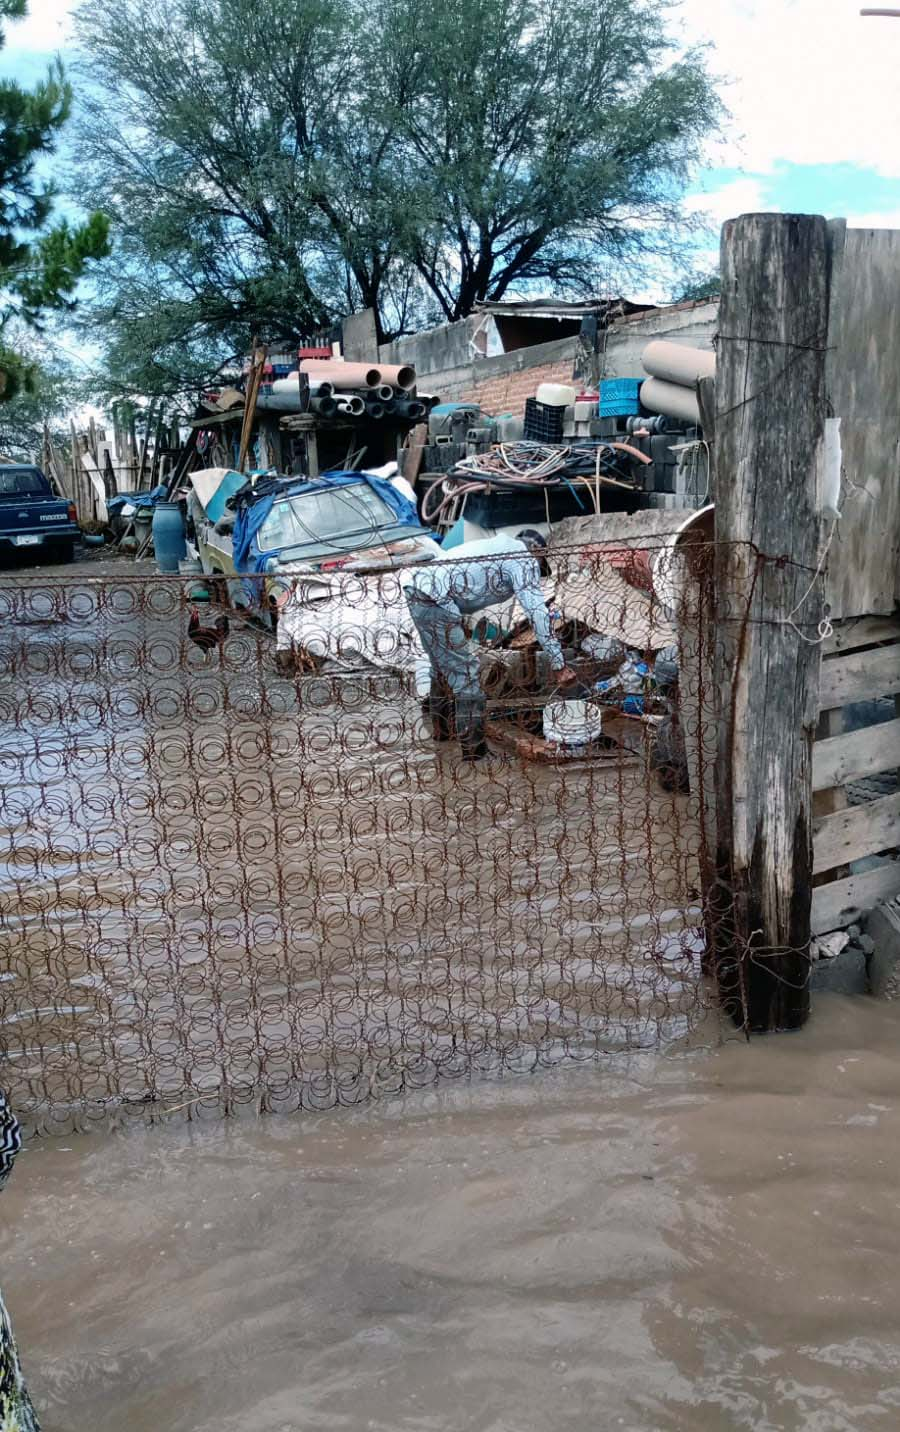 fuertes lluvias en la zona metropolitana